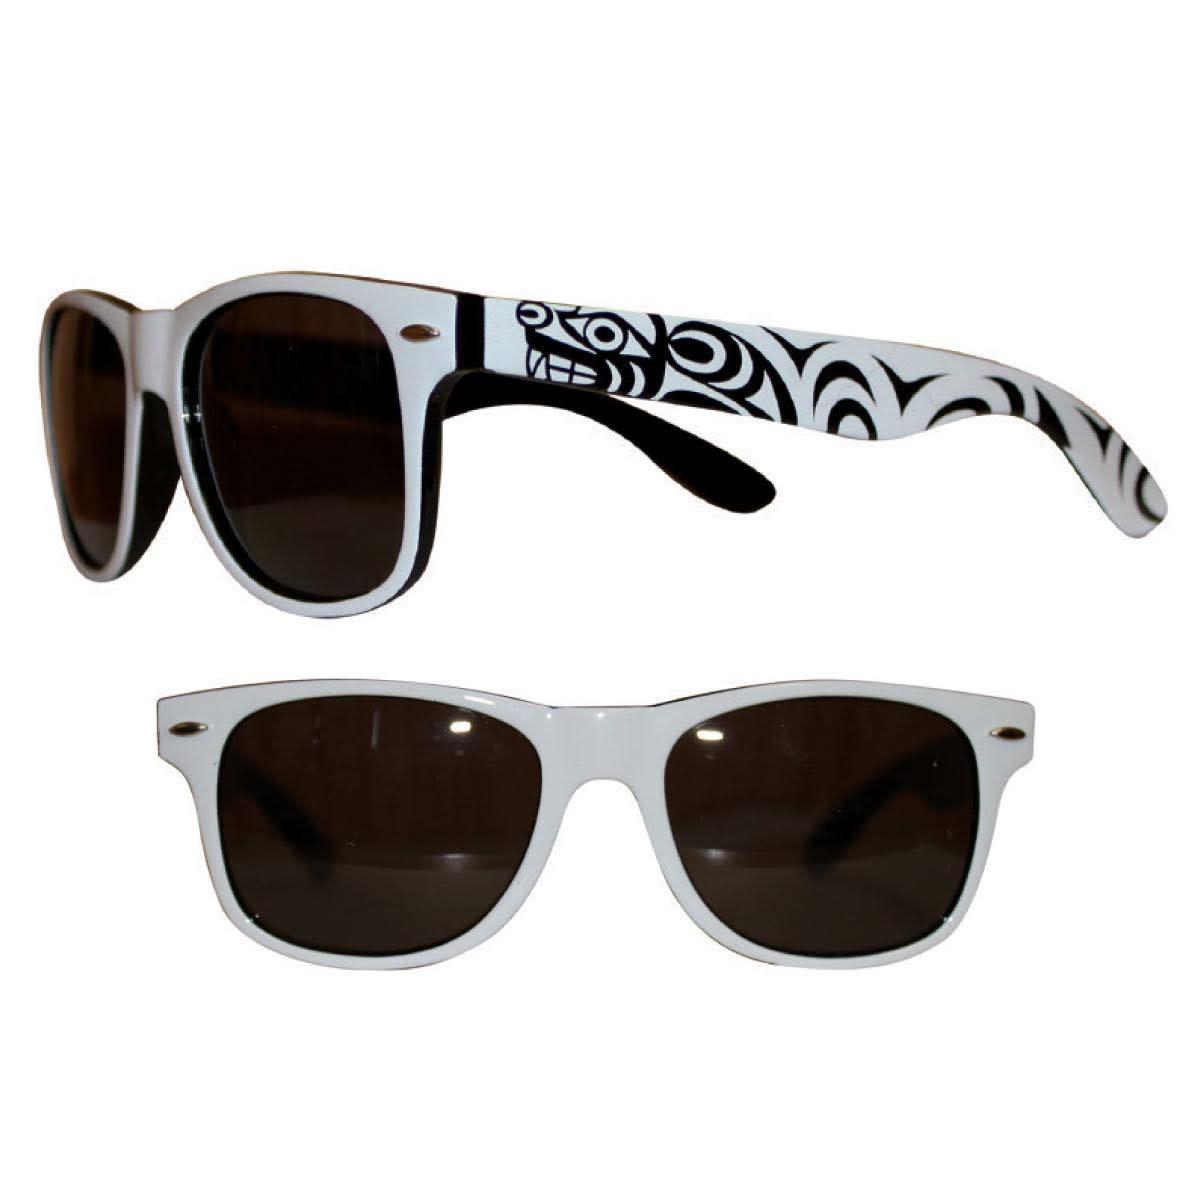 SunGlasses - Adult-8